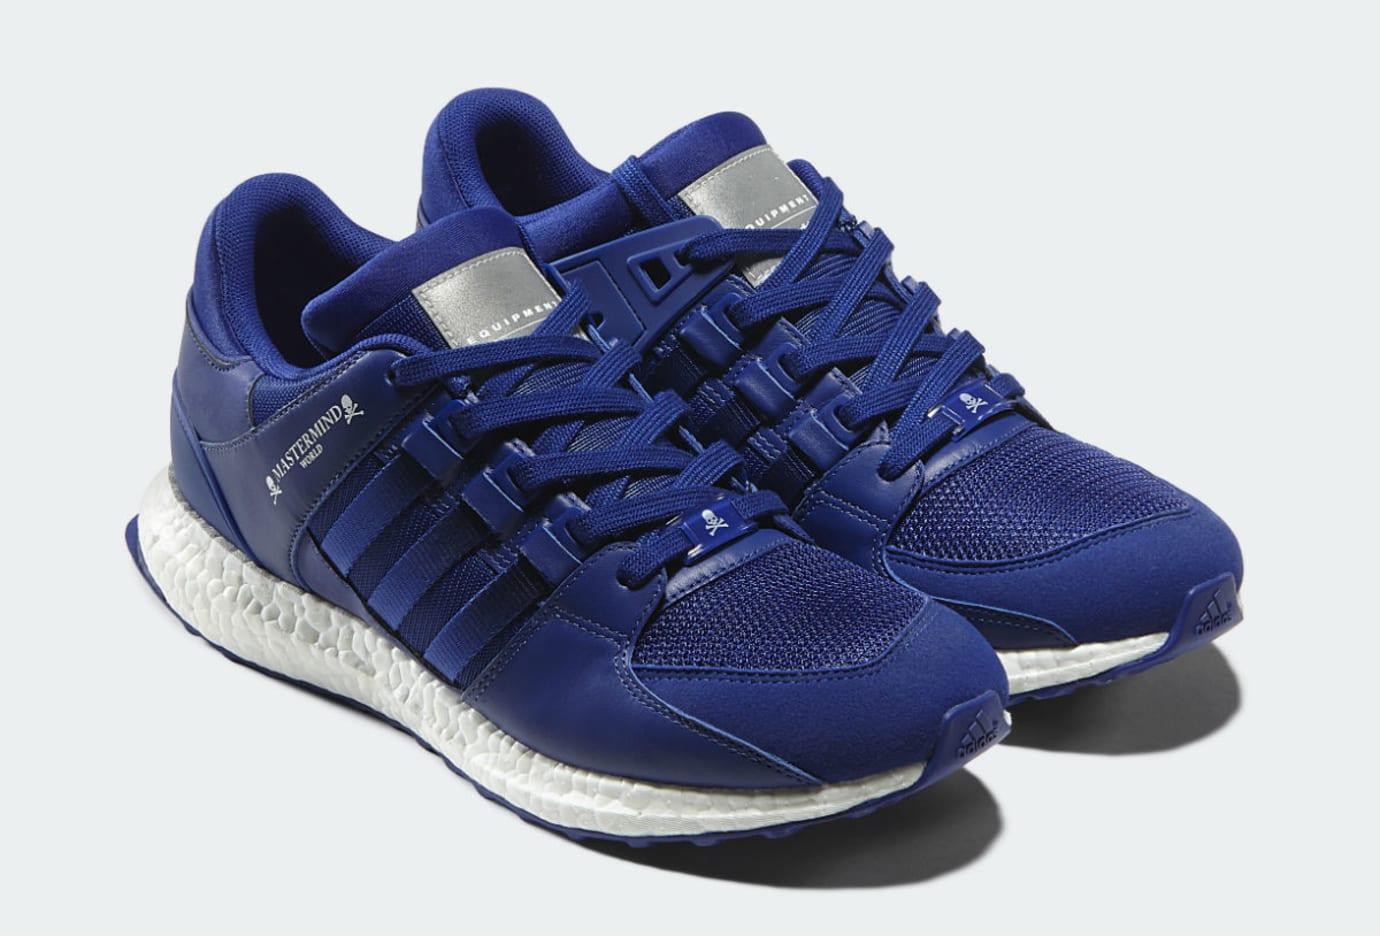 Mastermind x Adidas EQT Support Ultra Blue Release Date